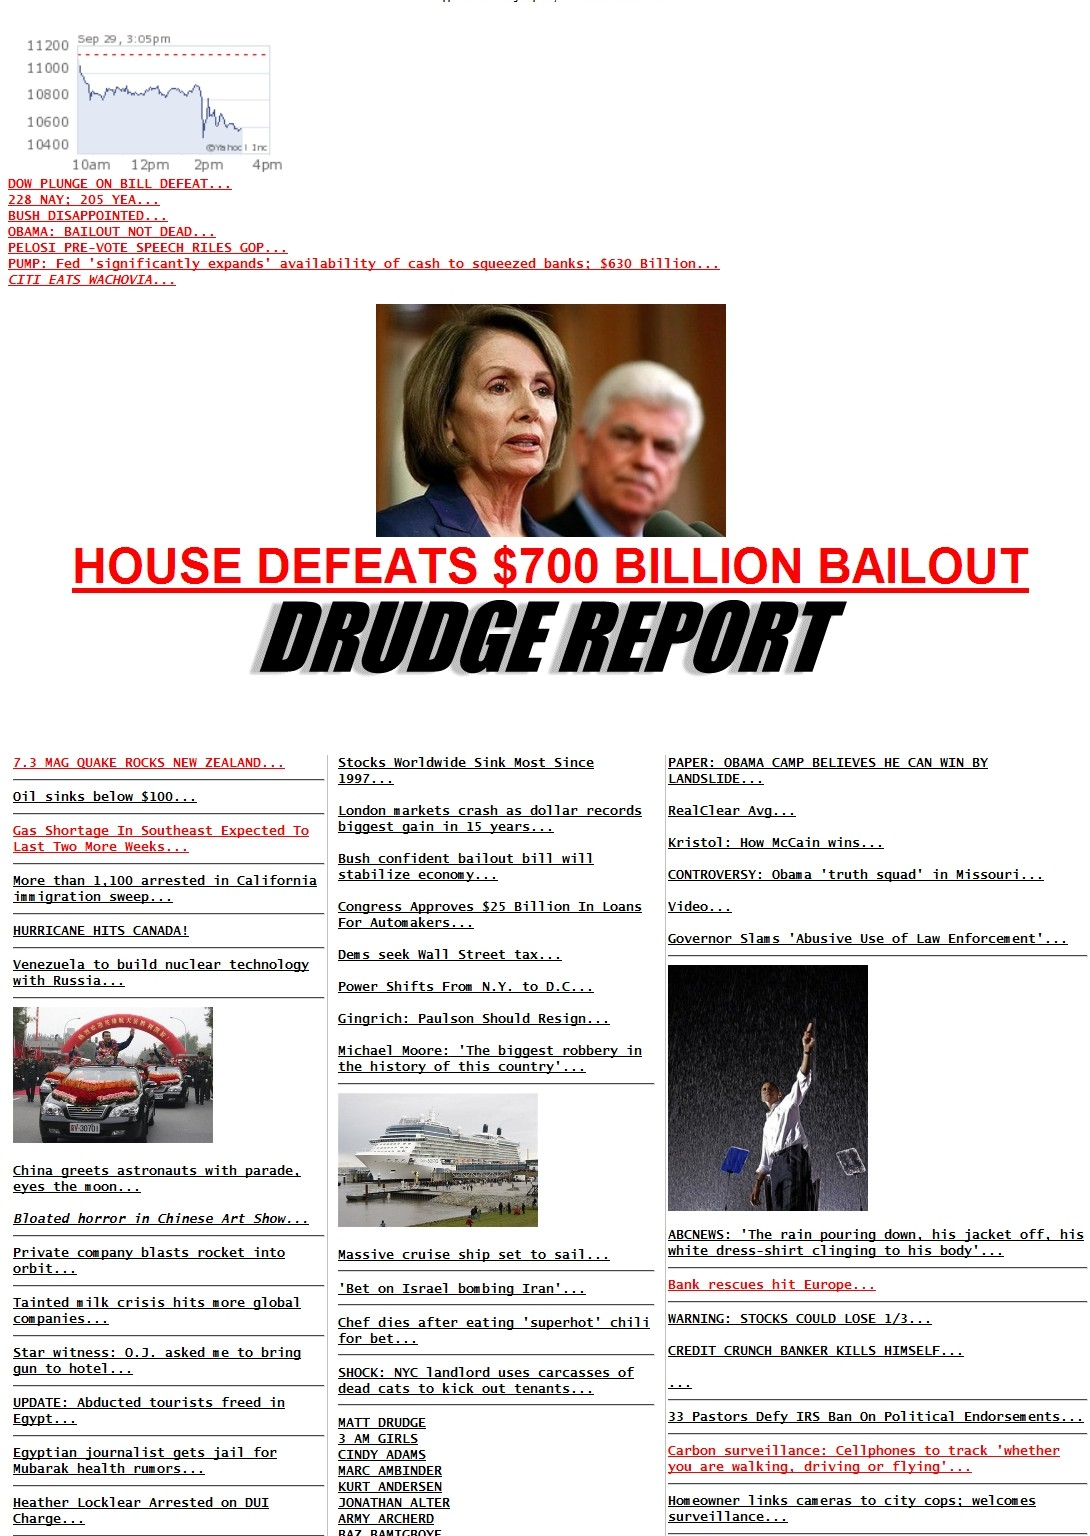 [DRUDGE+REPORT+2008.jpg]